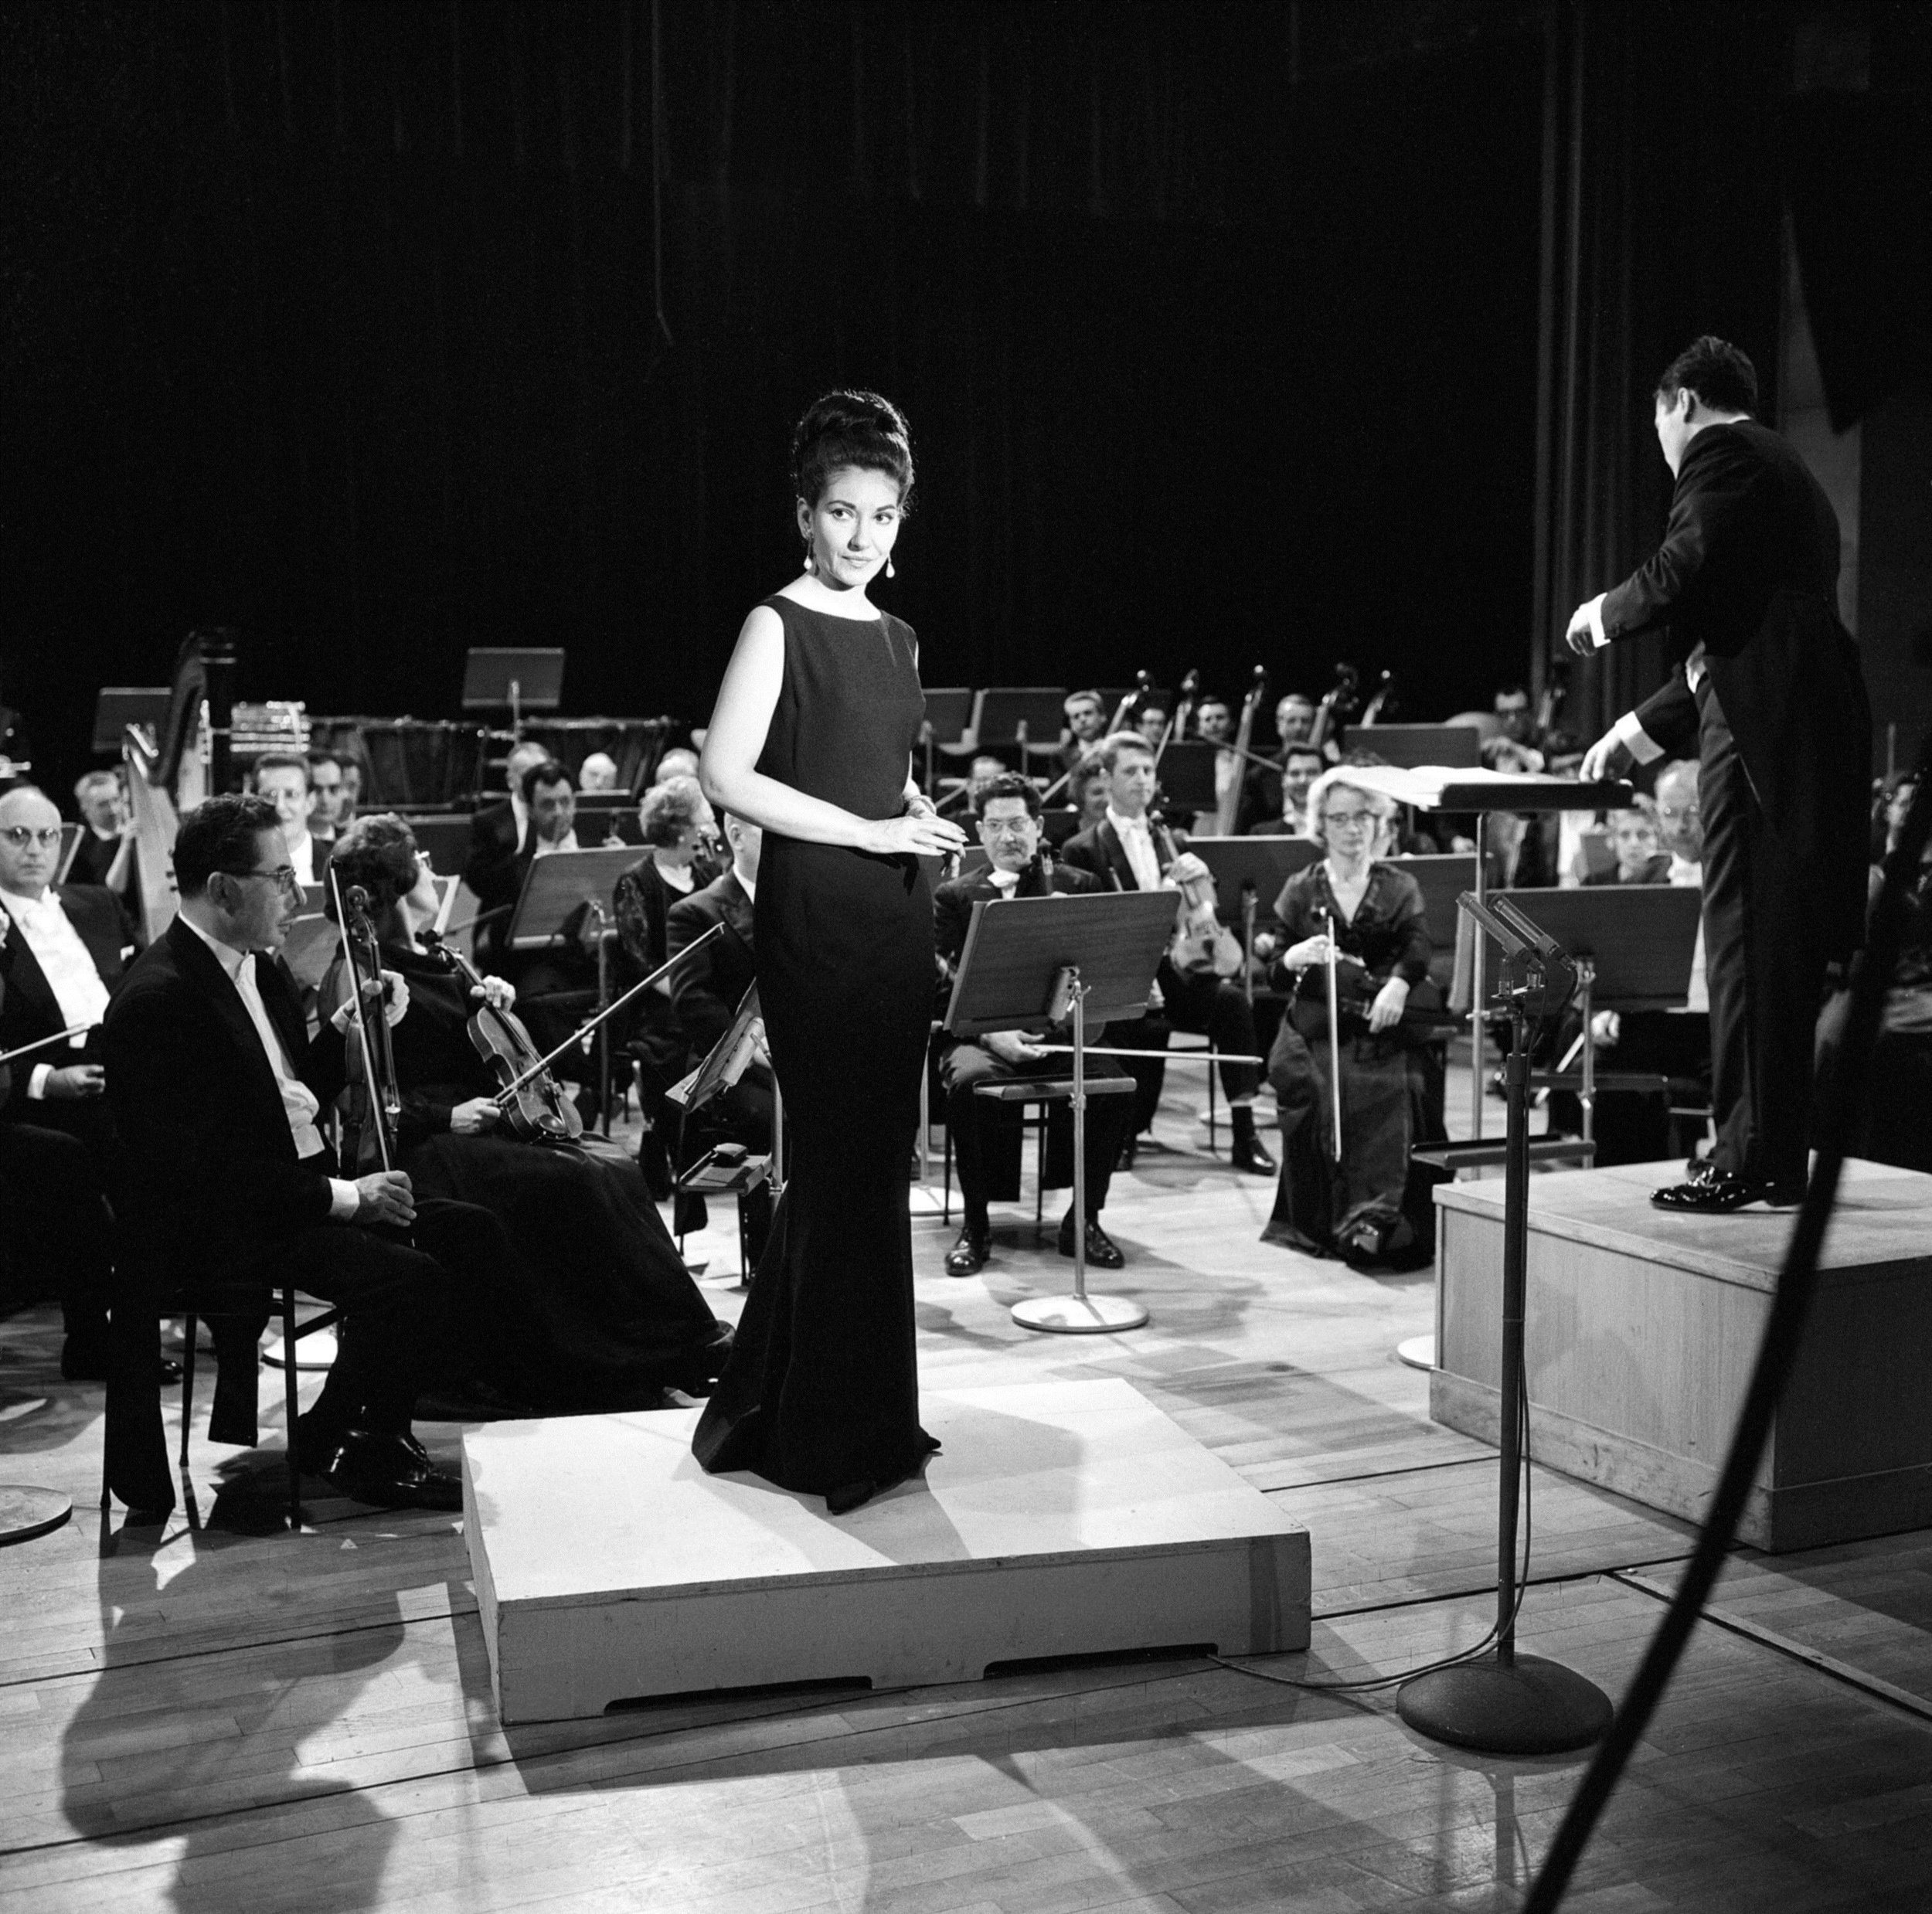 Les Grands InterprÇtes, Paris 1965 Copyright Fonds de Dotation Maria Callas.JPG